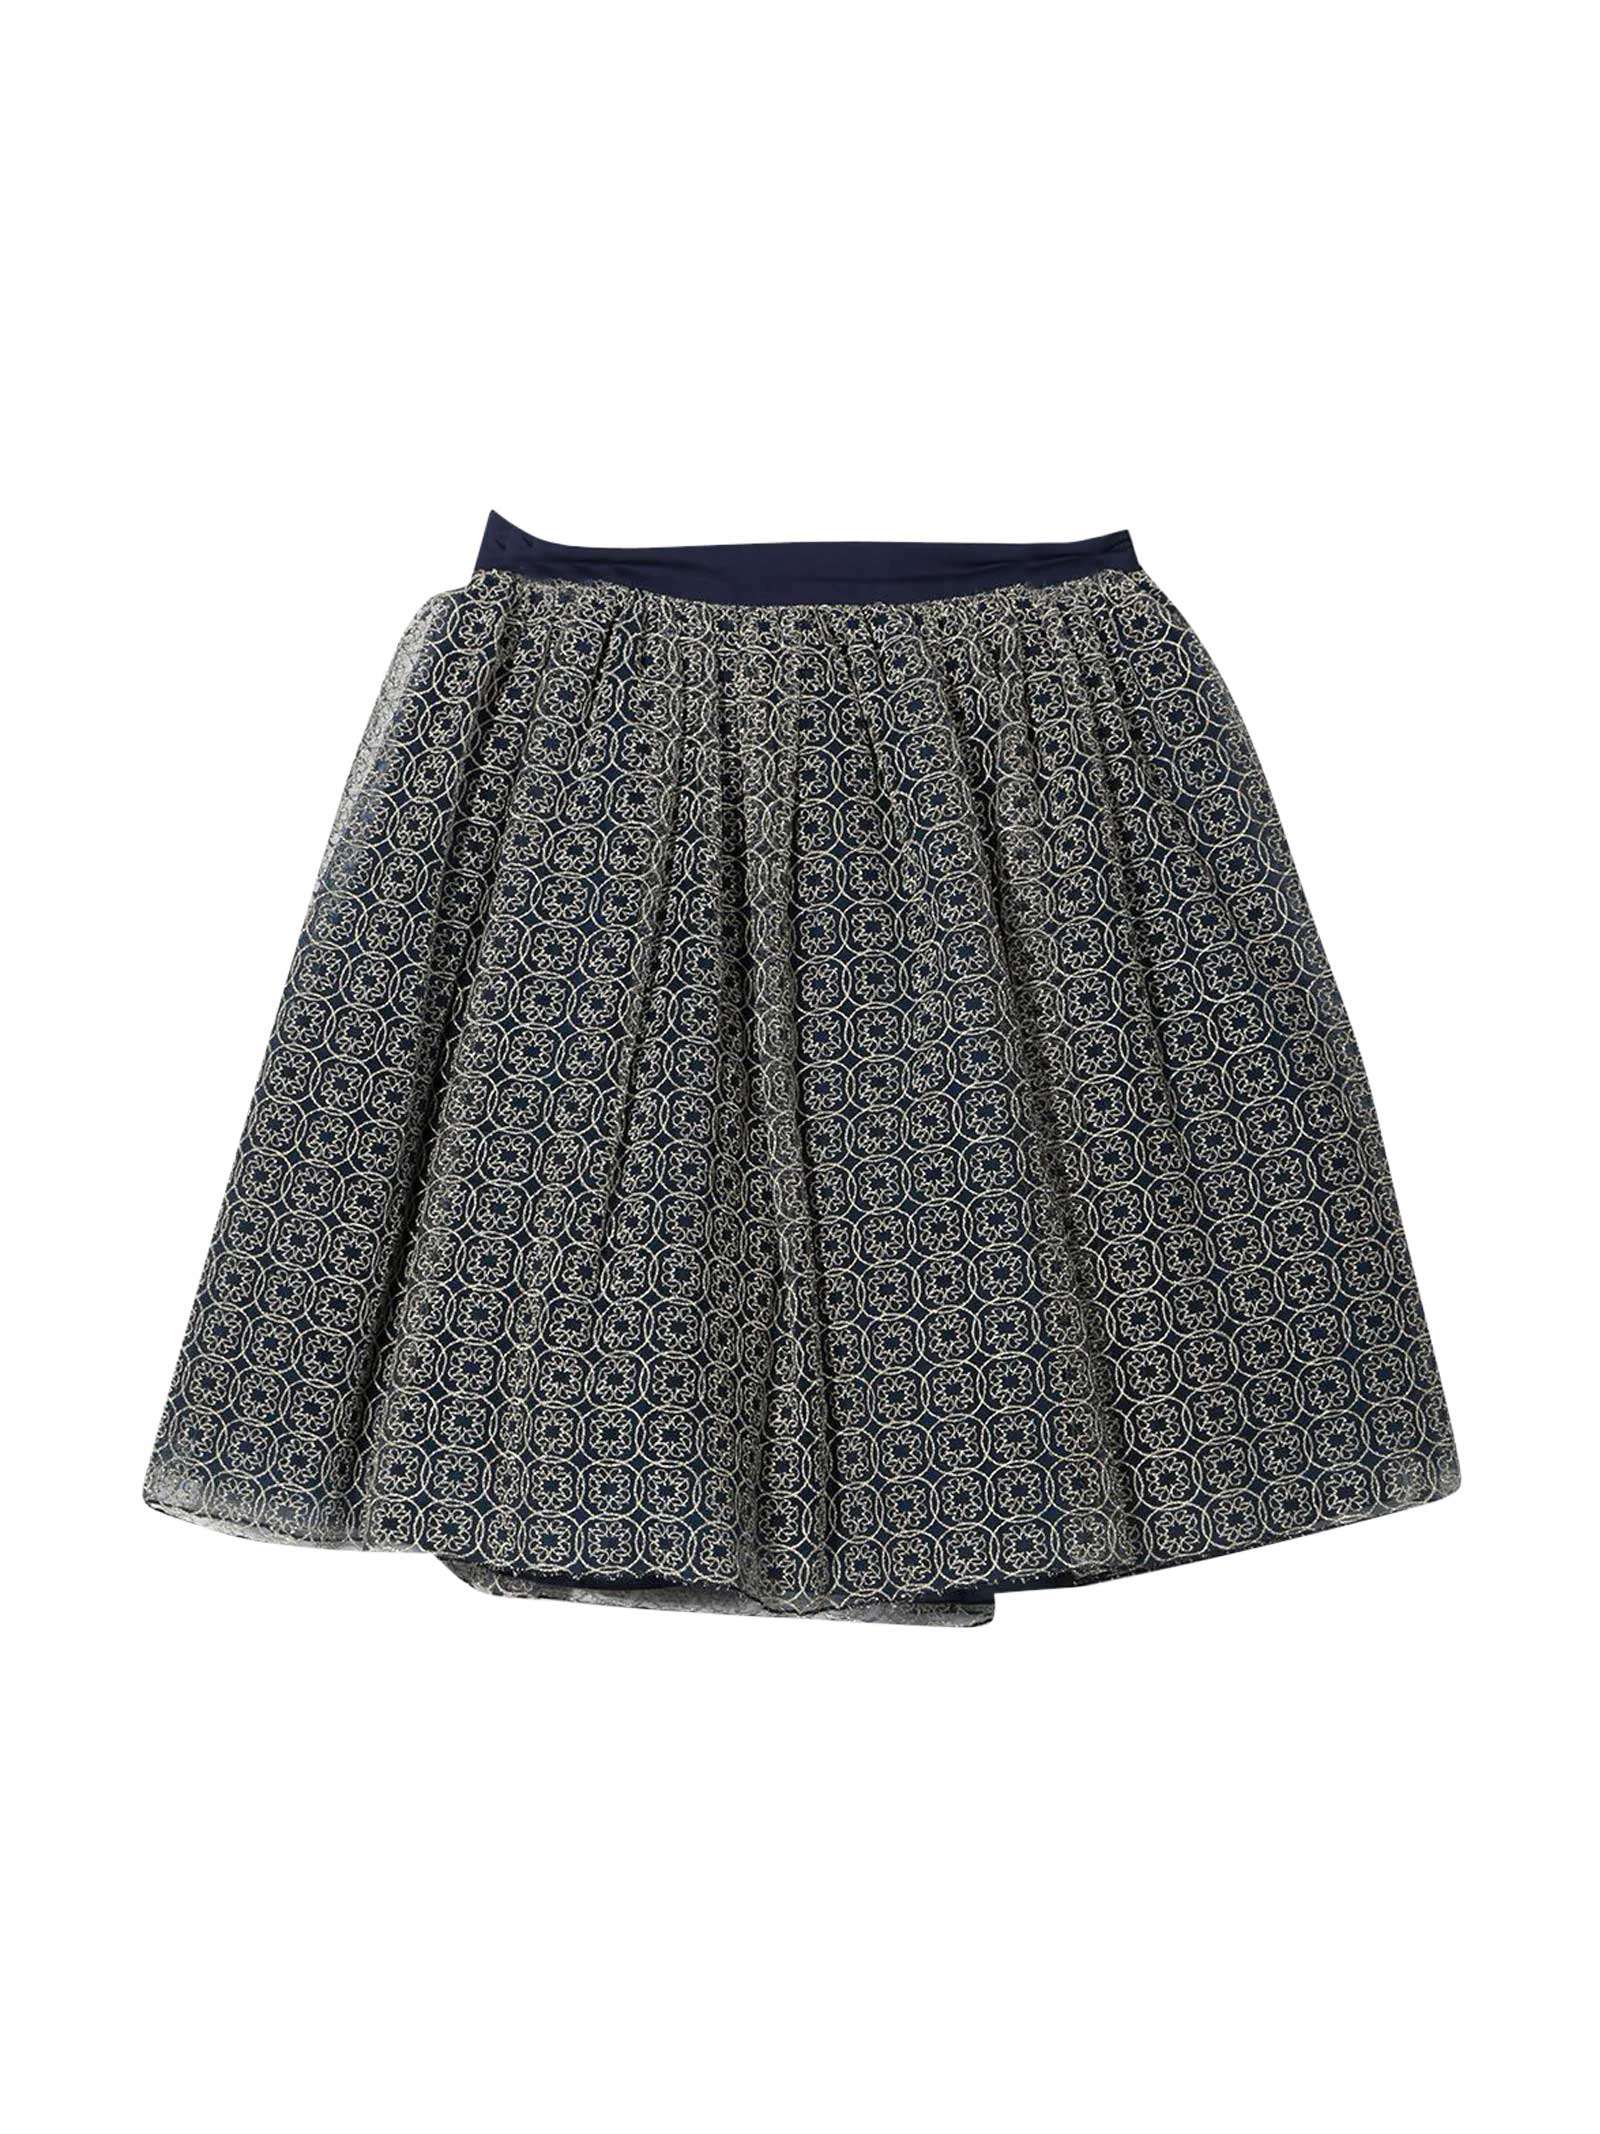 Elie Saab Blue Skirt With Gold Print